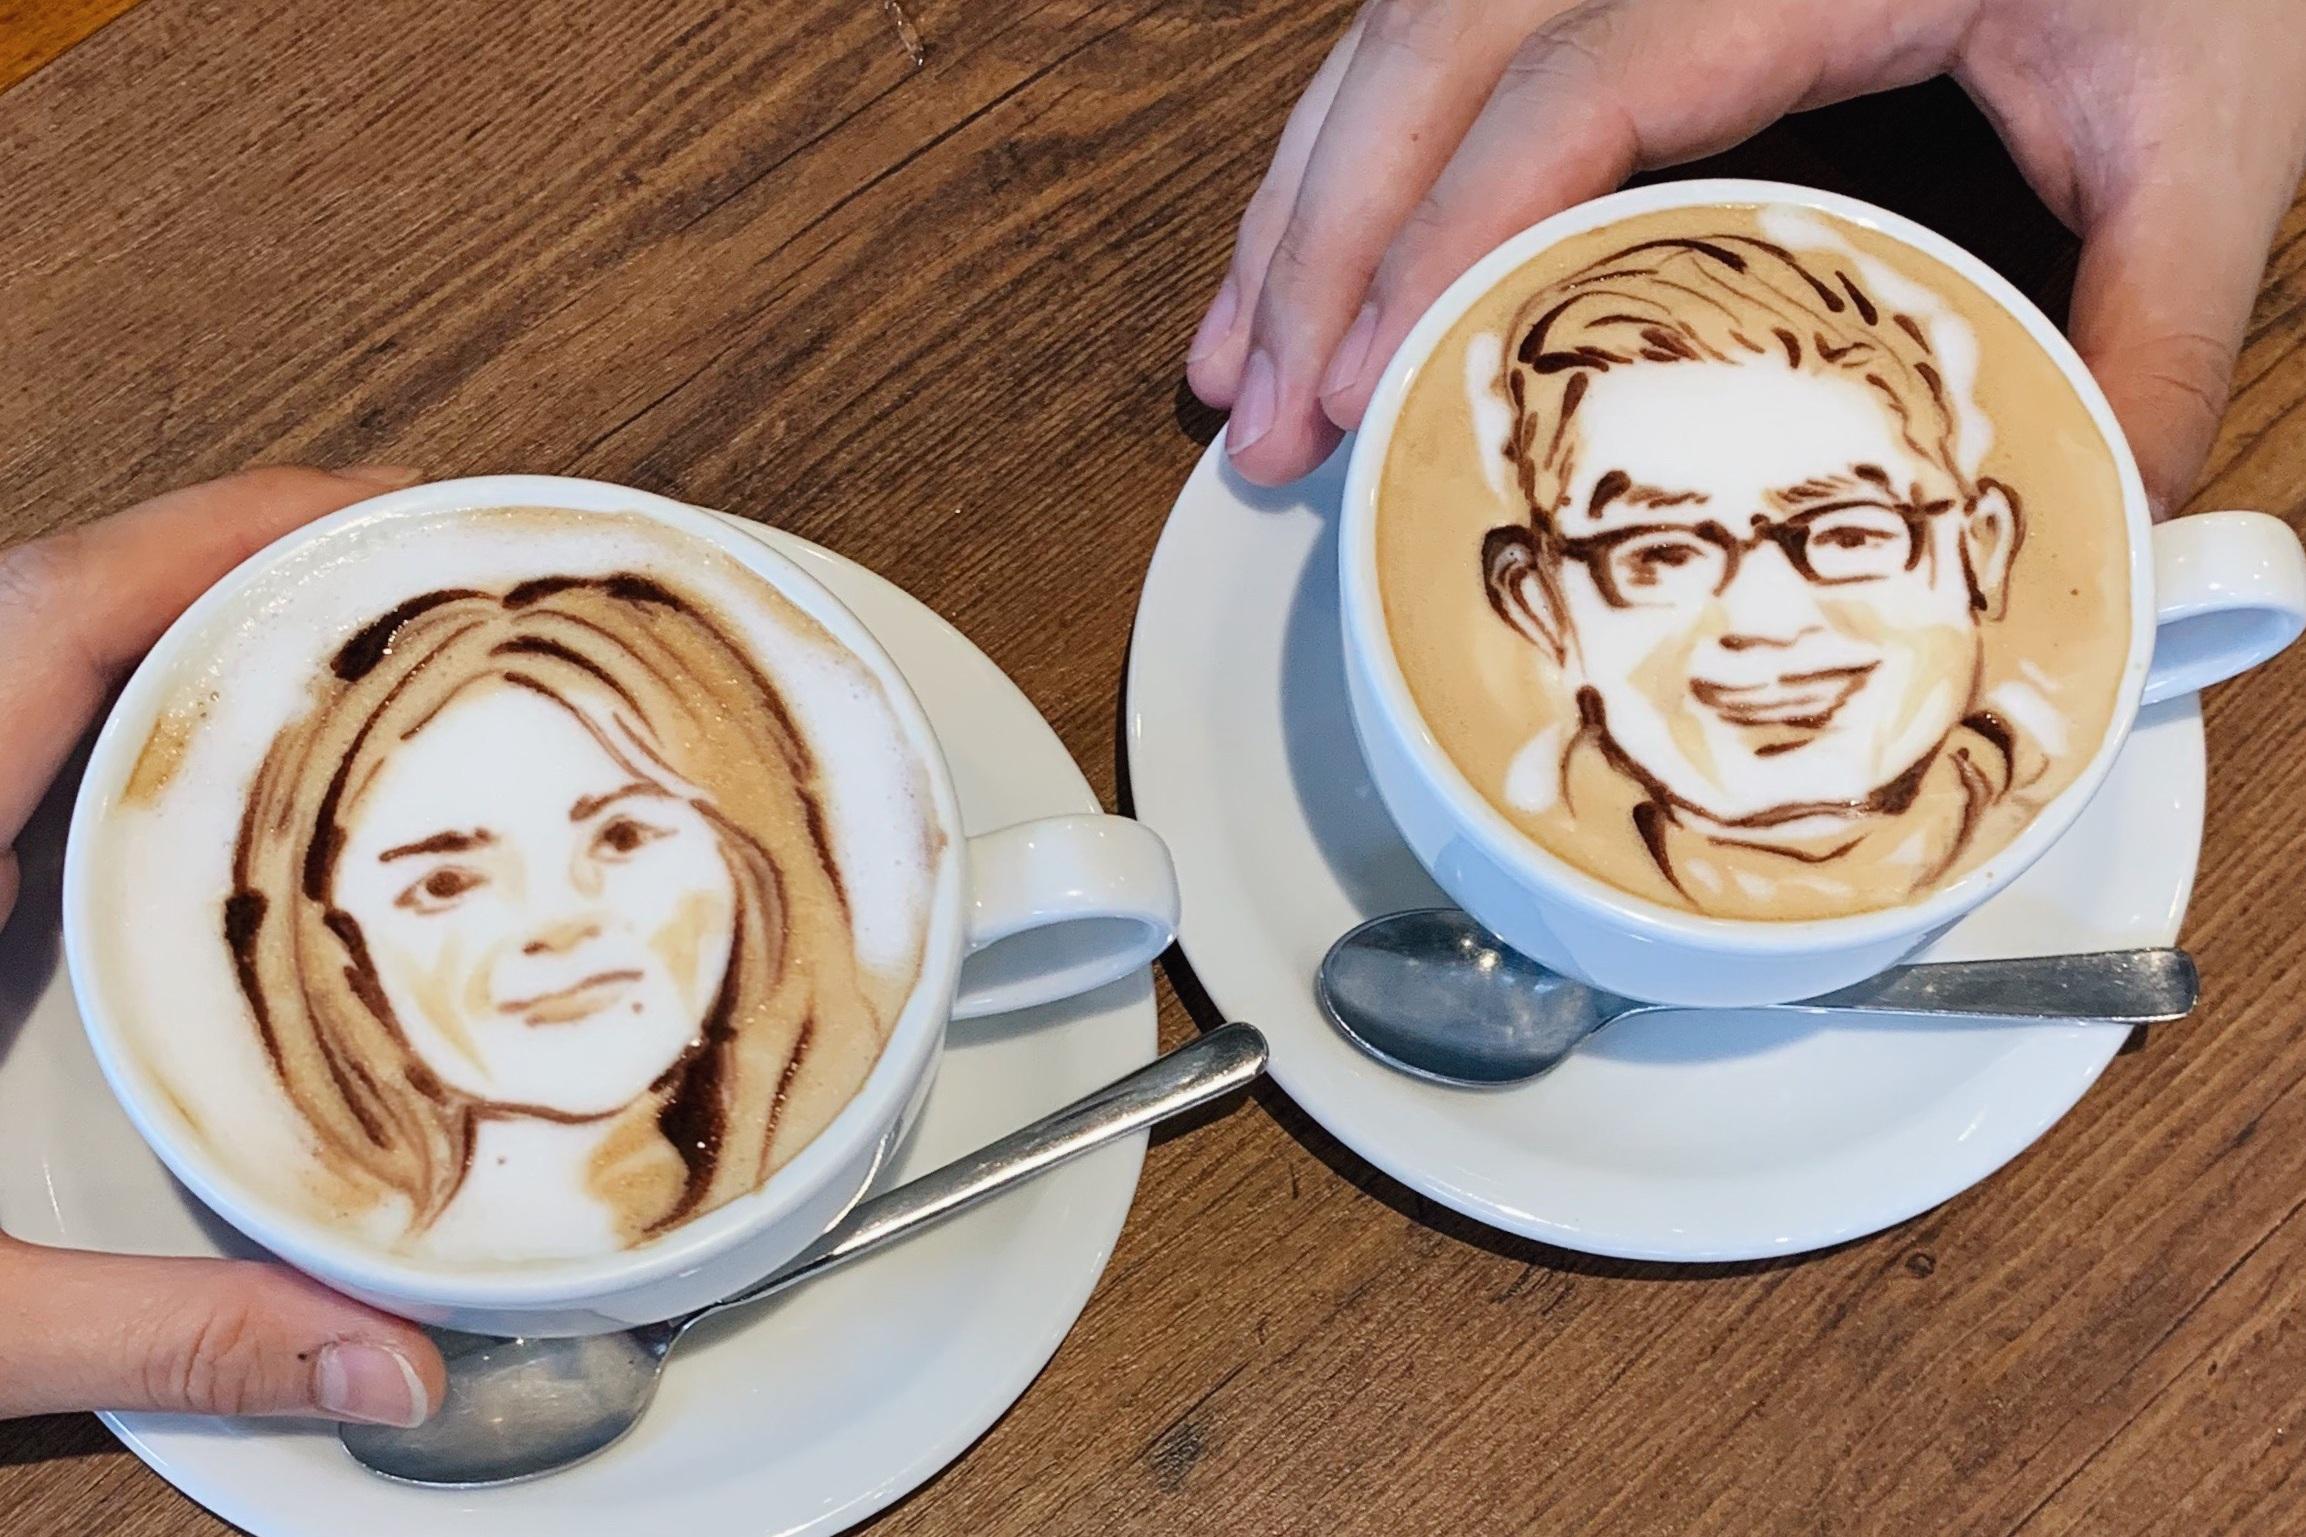 Our custom portrait latte art at Reissue